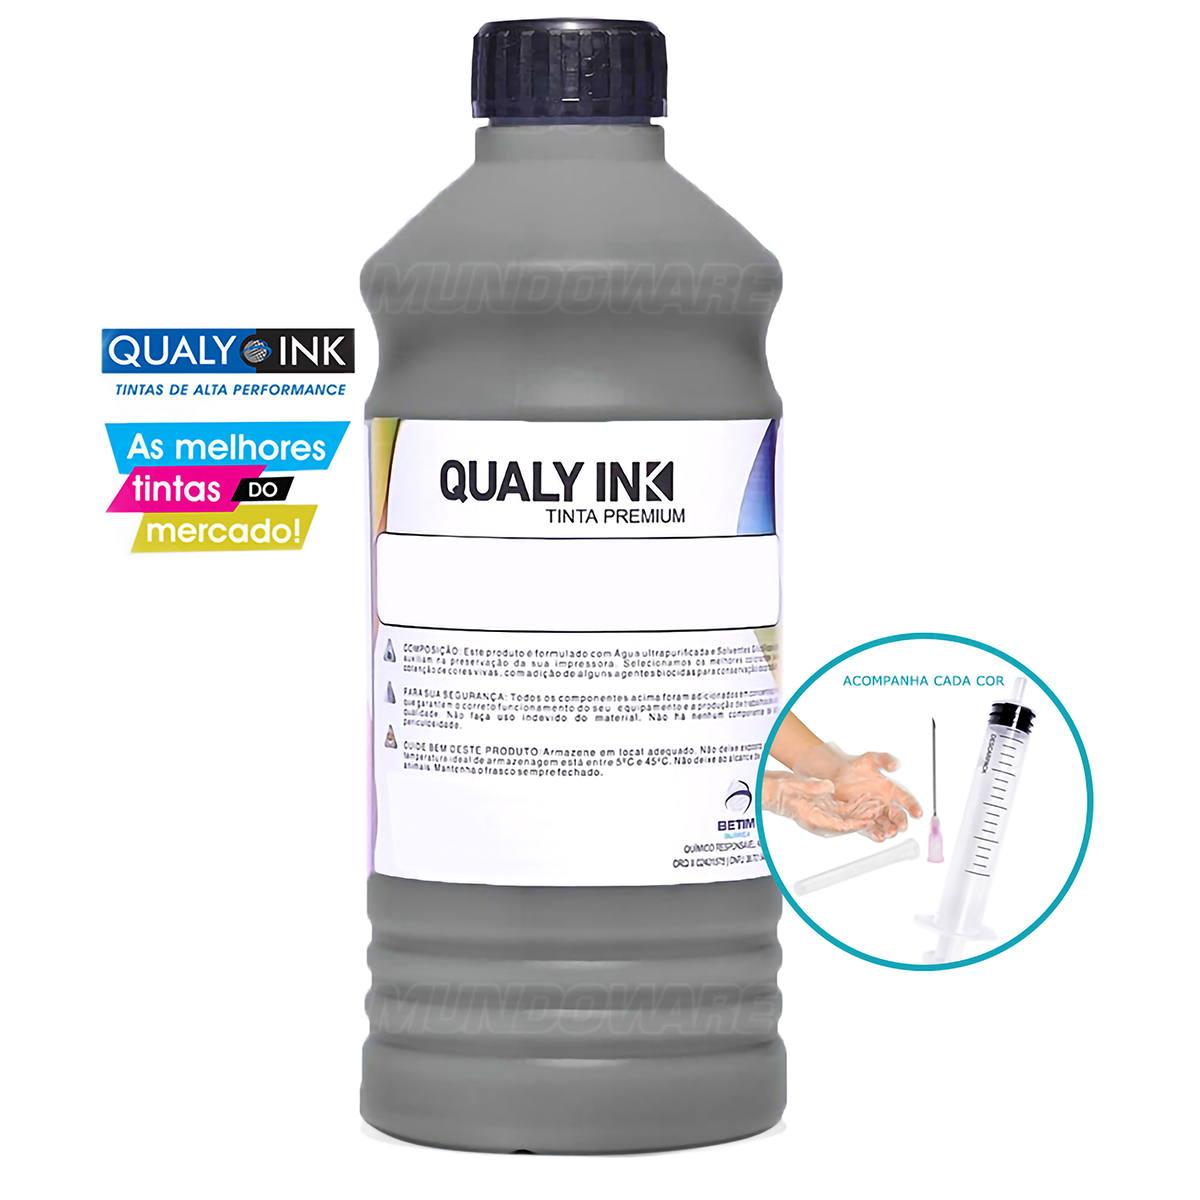 Compatível: Tinta Corante Qualy-Ink BC3E-1509 Série 673 para Epson L800 L805 L810 L850 L1800 Preto 1L